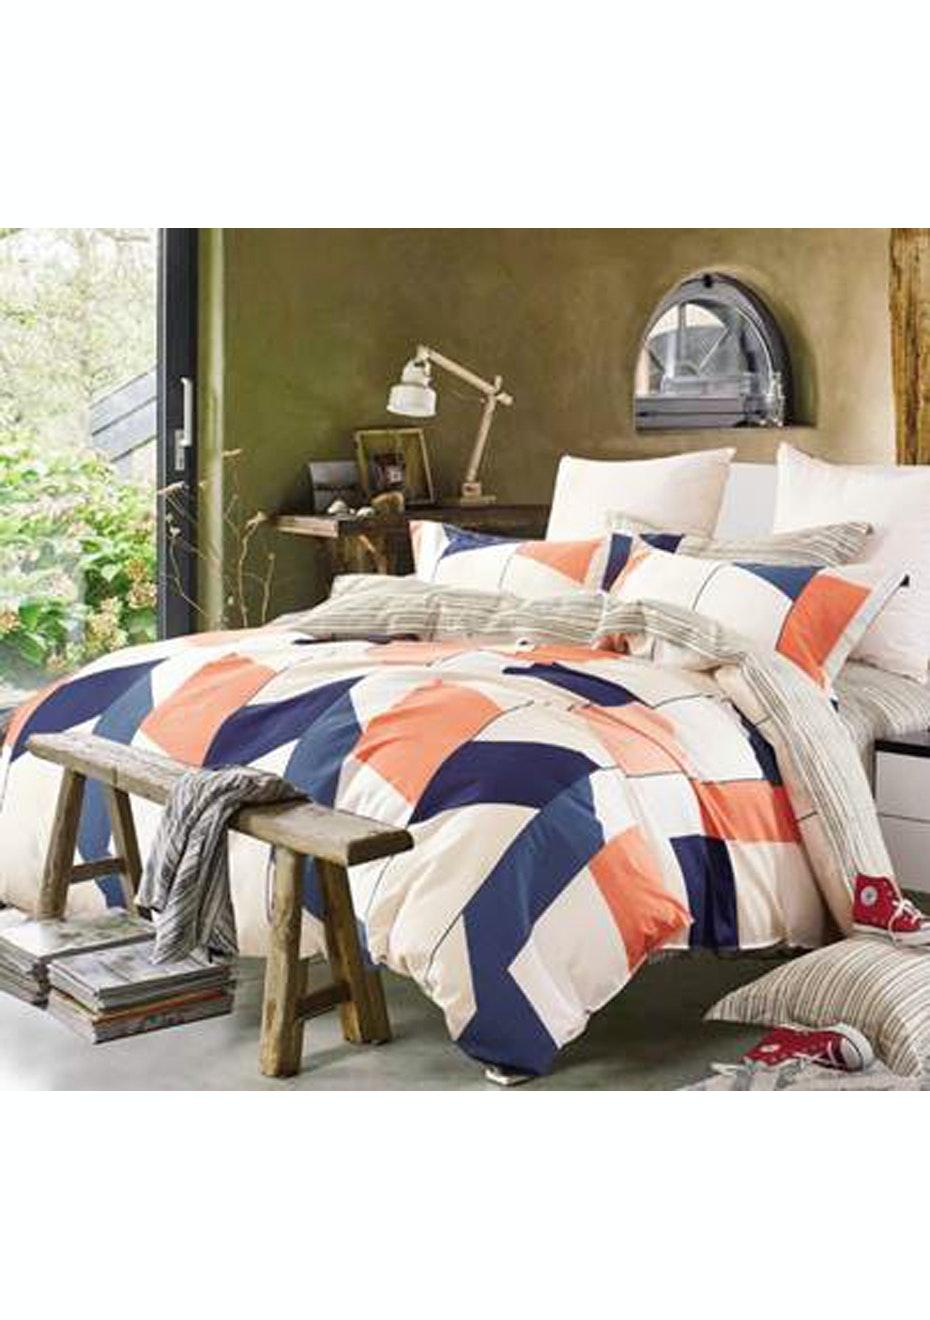 Isla Quilt Cover Set - Reversible Design - 100% Cotton -  Queen Bed